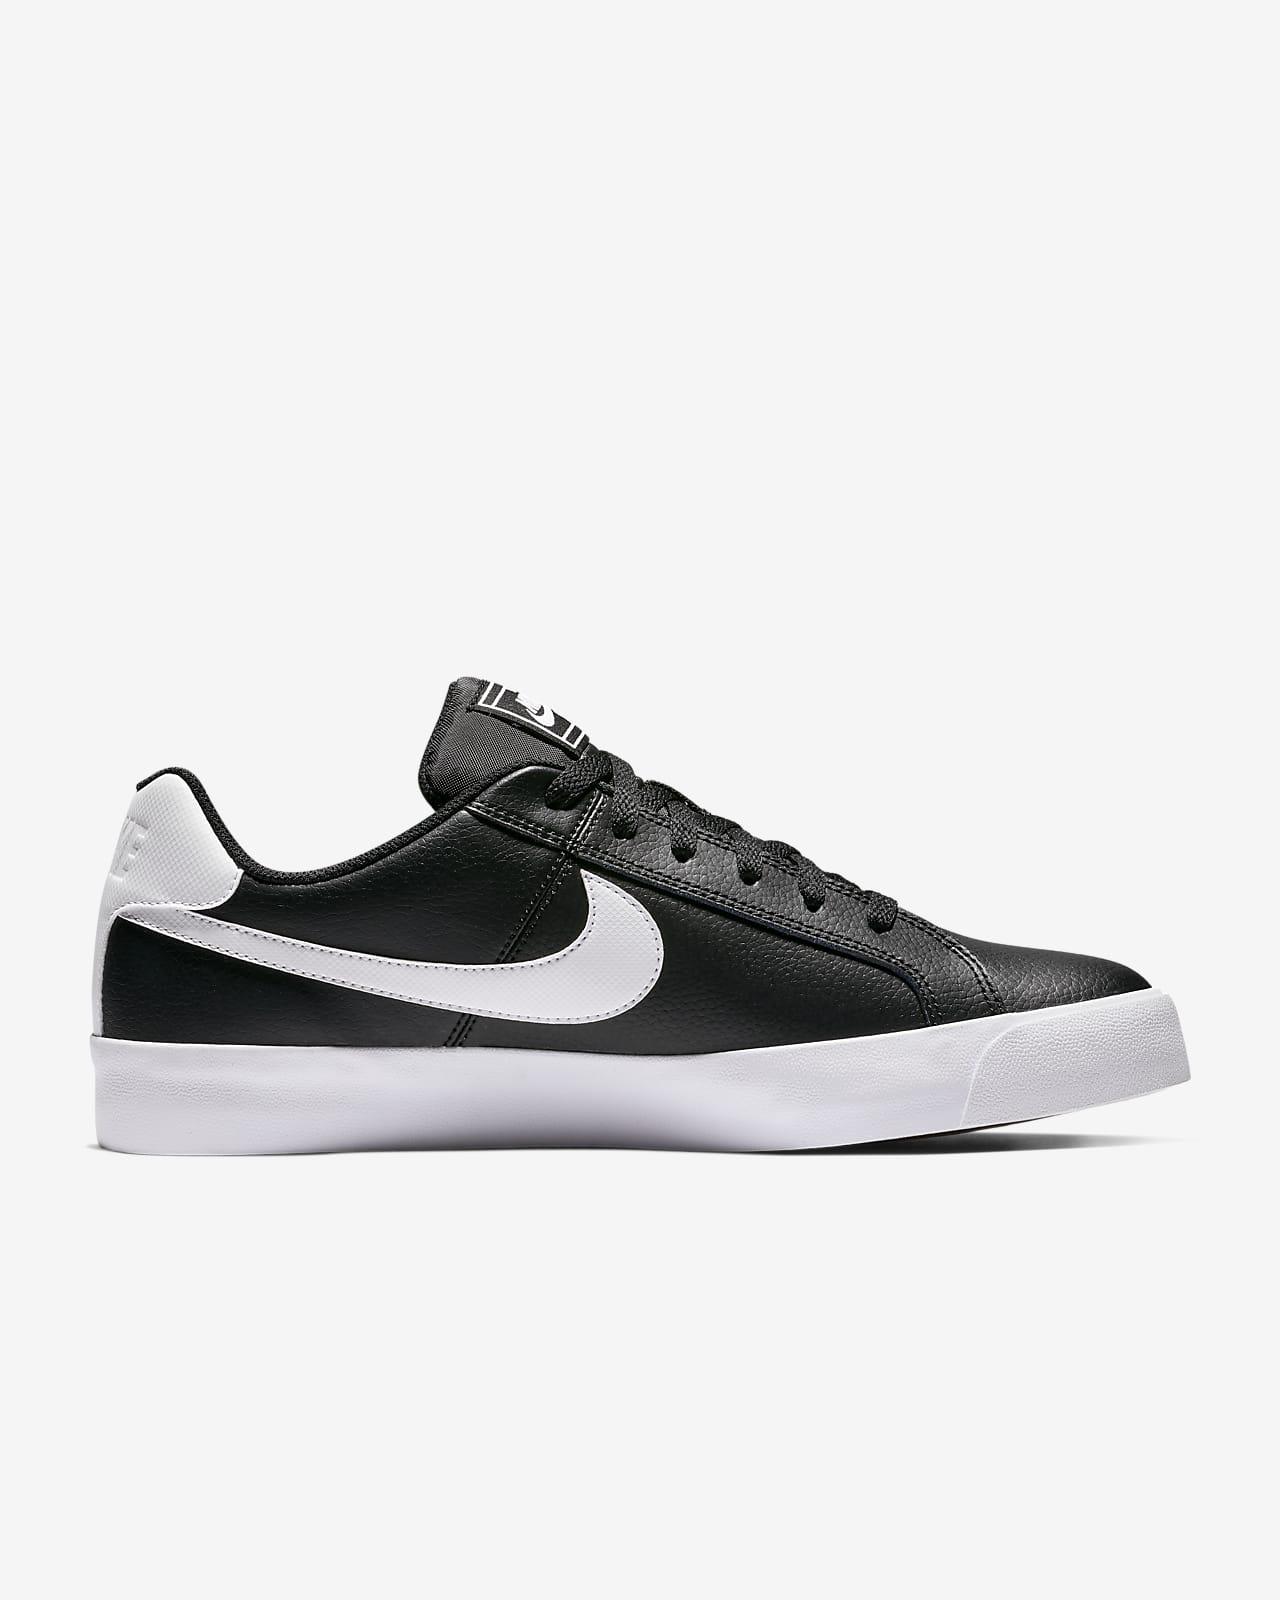 Inaccesible Enorme Bermad  Calzado para hombre NikeCourt Royale AC. Nike.com